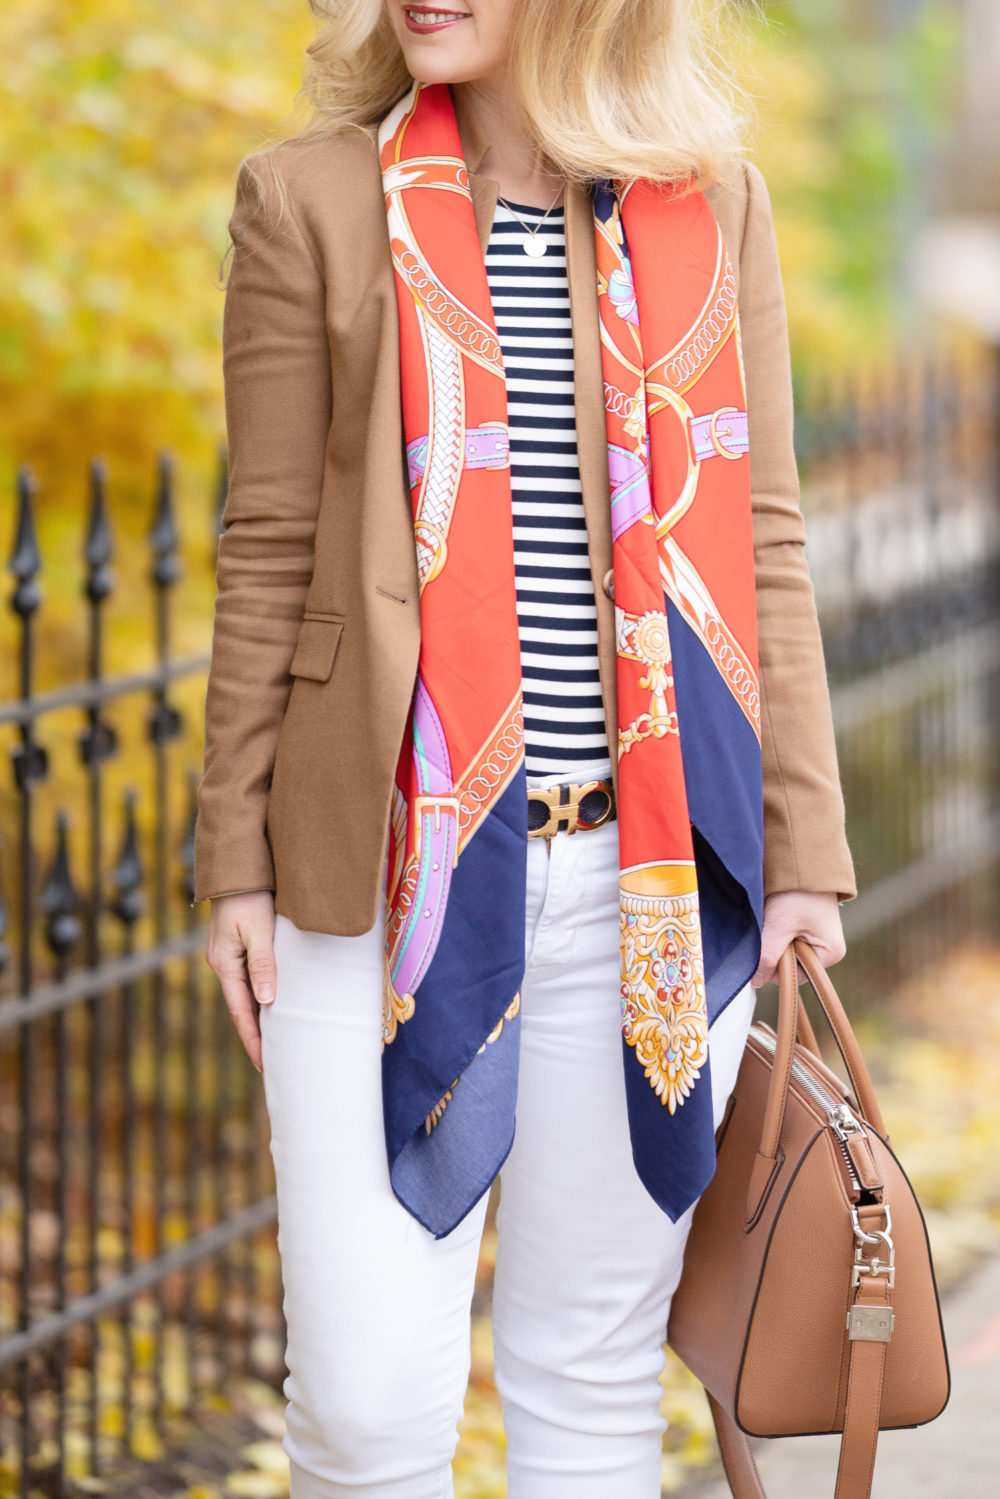 Petite Fashion Blog | Petite Style | J. Crew Regent Blazer | J. Crew Slim perfect long-sleeve T-shirt | Tuckernuck Colette Scarf | Everlane Day Heel | Gienchy Antogona Bag | Ferragamo Reversible Belt